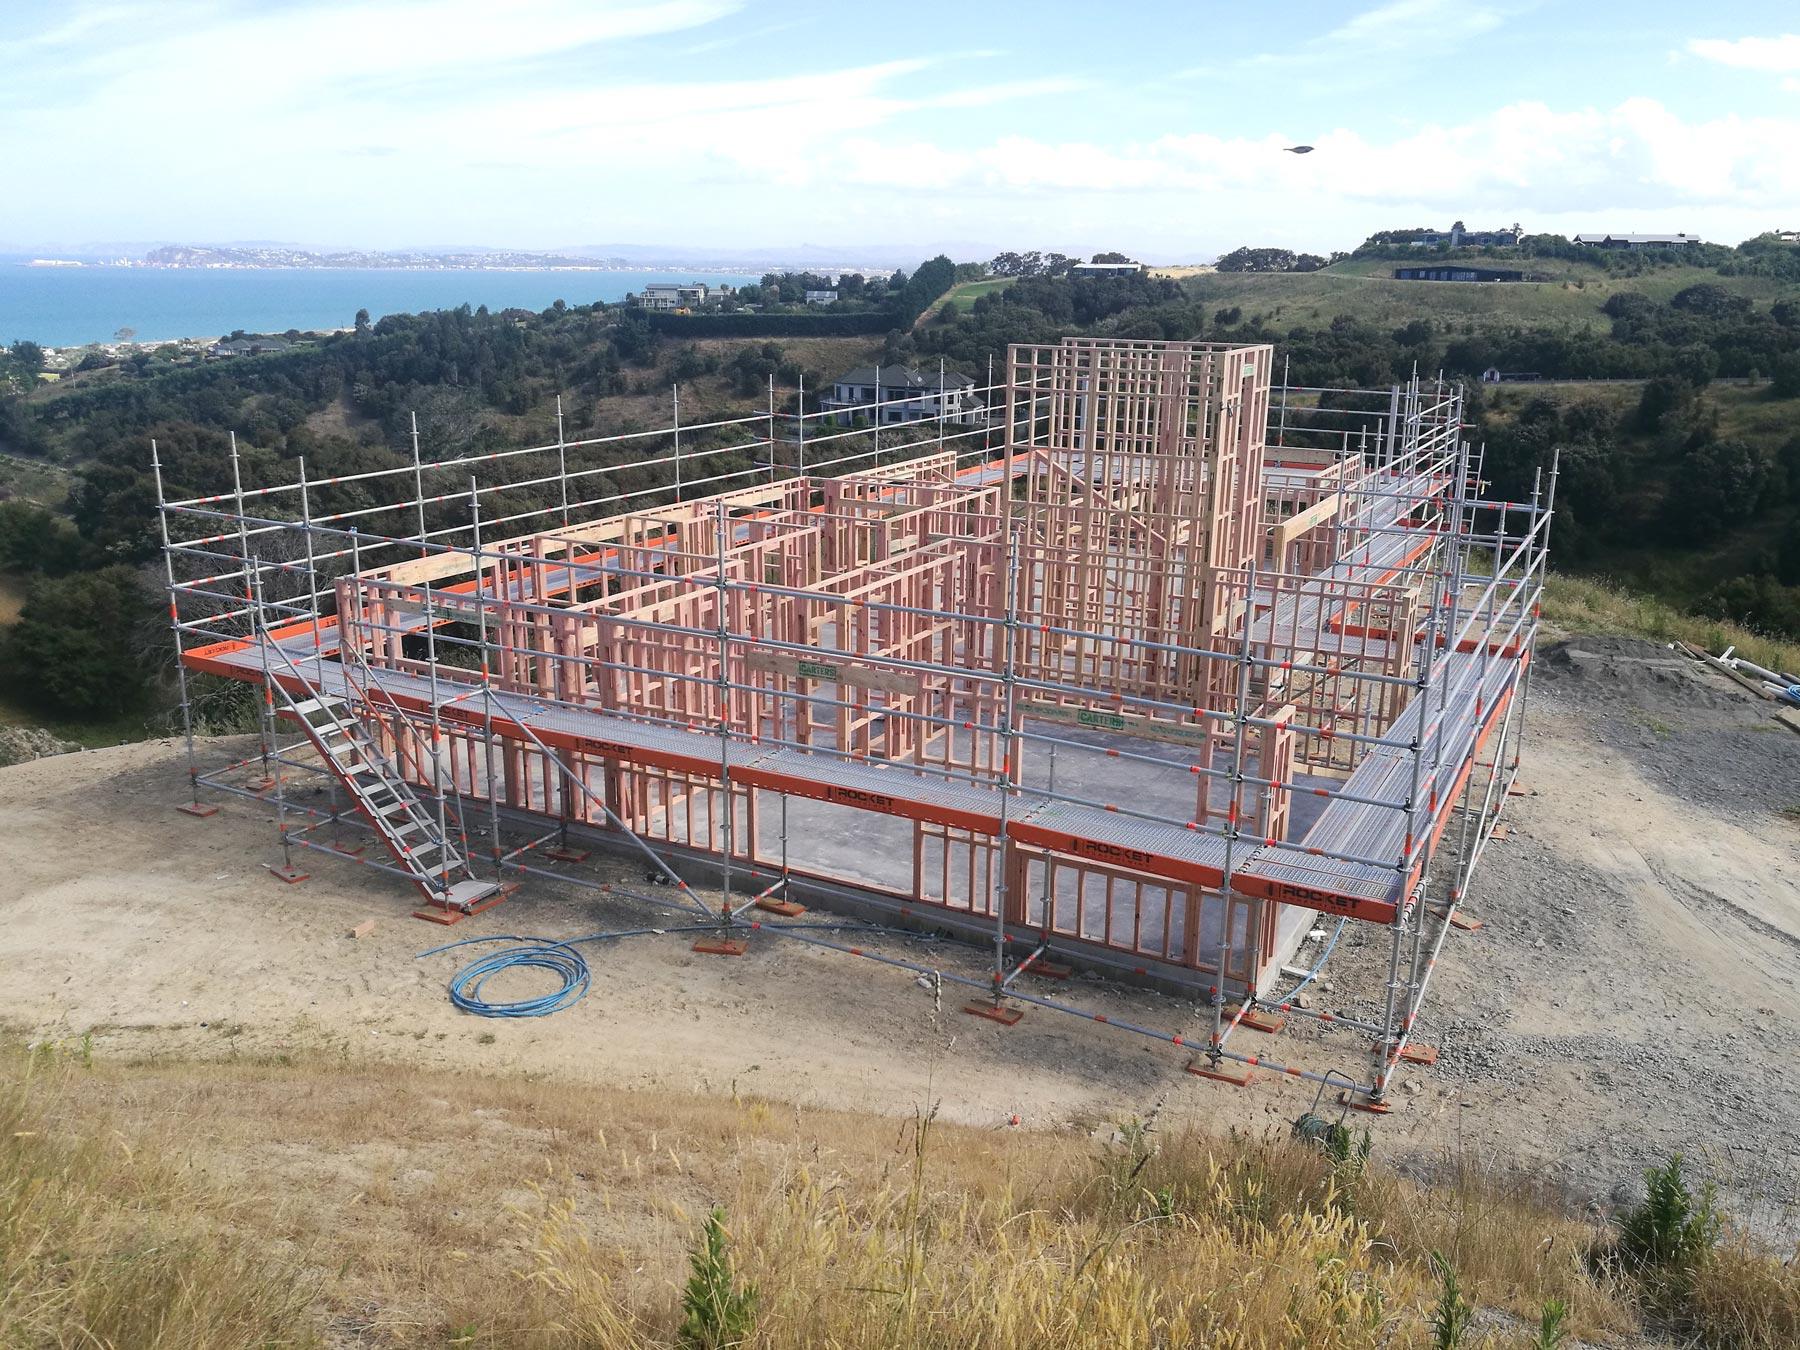 https://rocketscaffold.nz/wp-content/uploads/2019/08/img-rocket-scaffolding-house-new.jpg